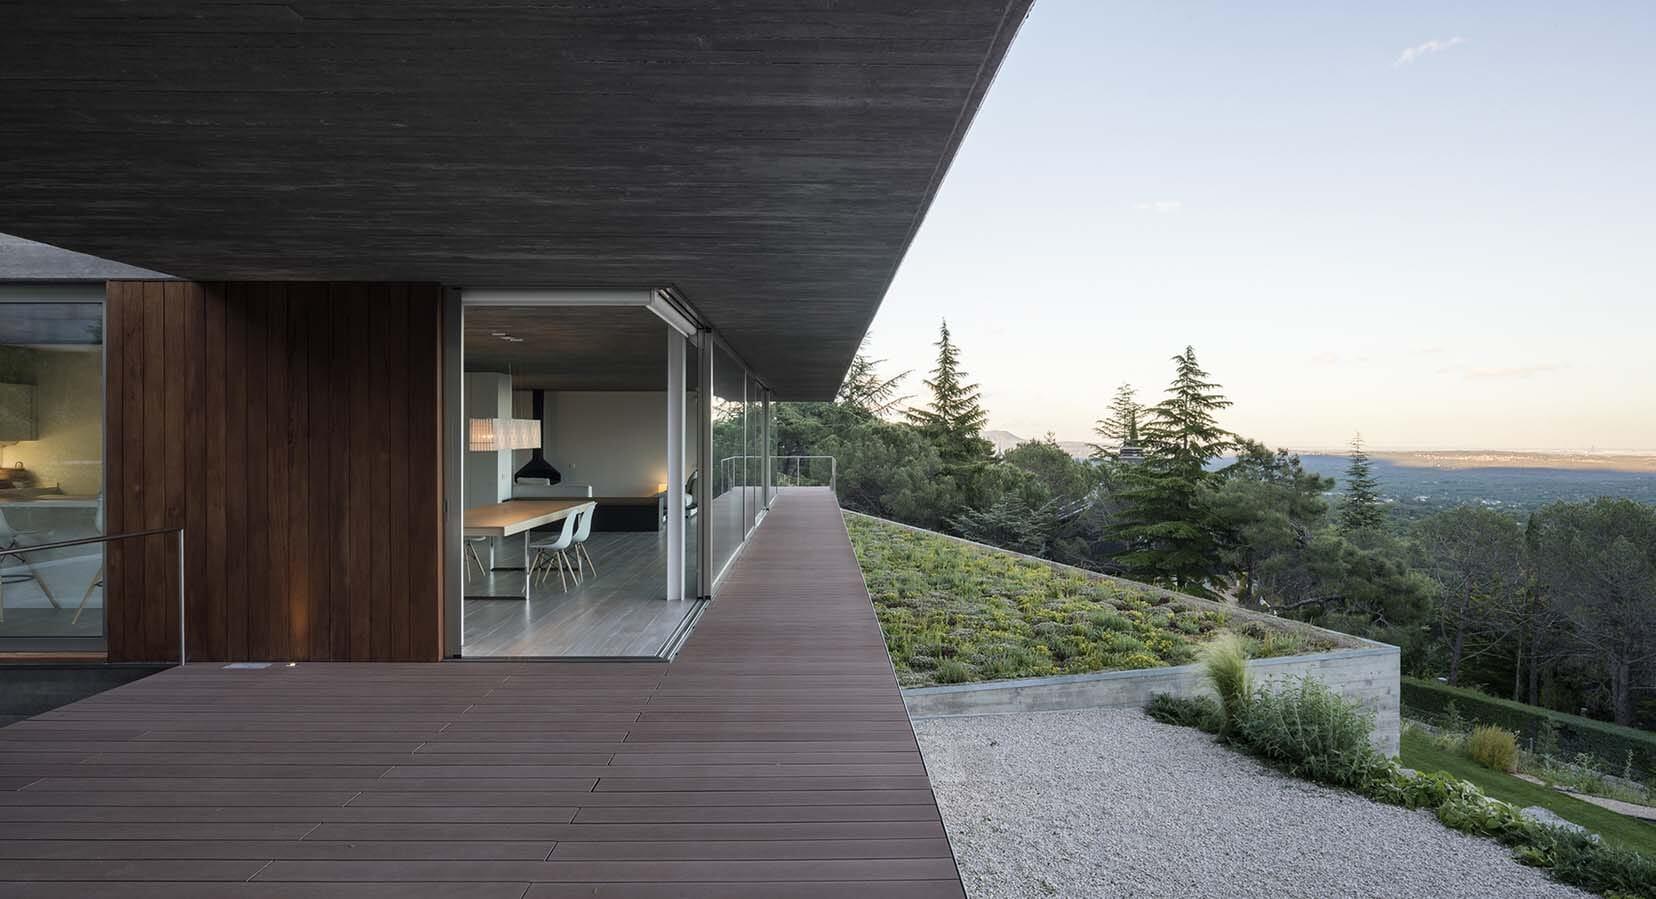 How An Oak Tree Inspired This Stunning Spanish Retreat By Aranguren & Gallegos Arquitectos